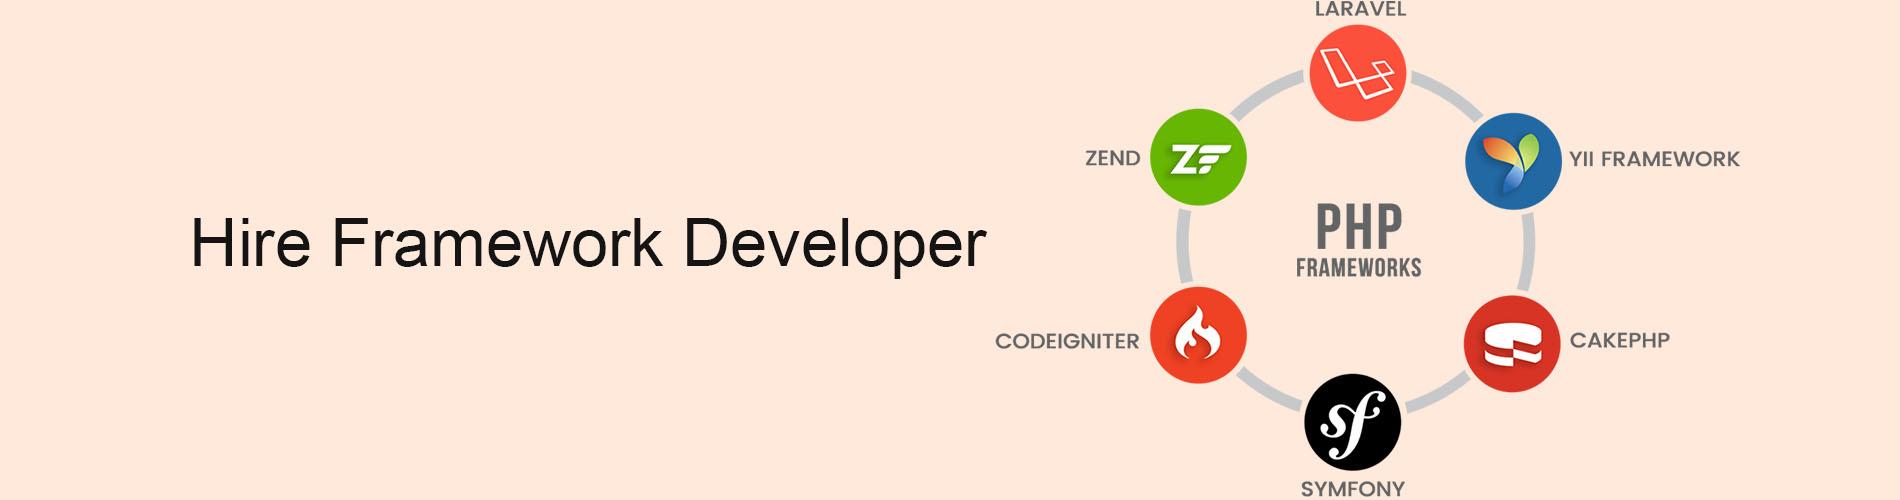 hire-framework-developer